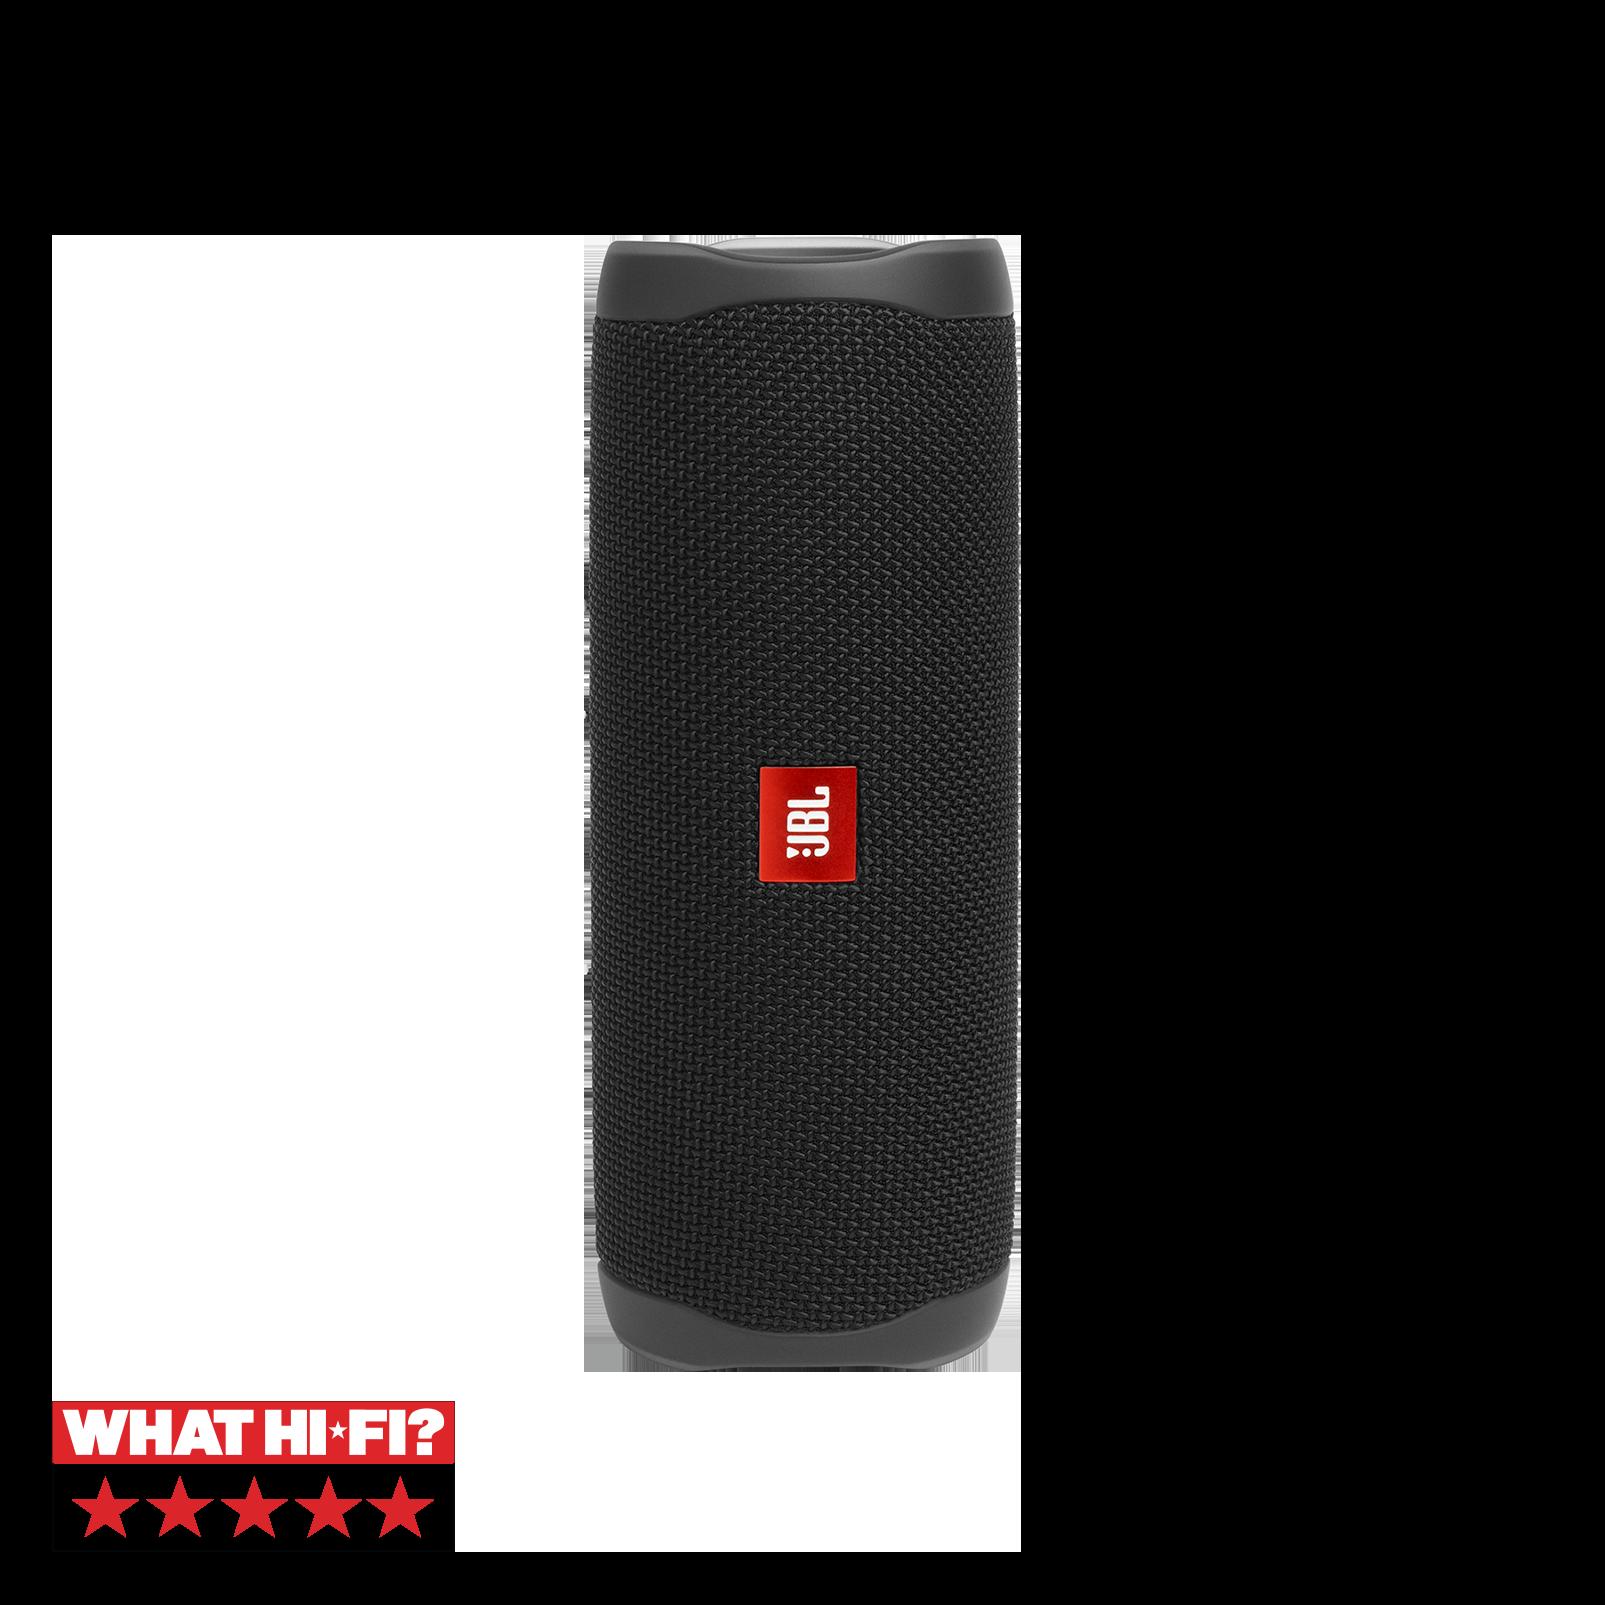 JBL FLIP 5 - Black Matte - Portable Waterproof Speaker - Hero